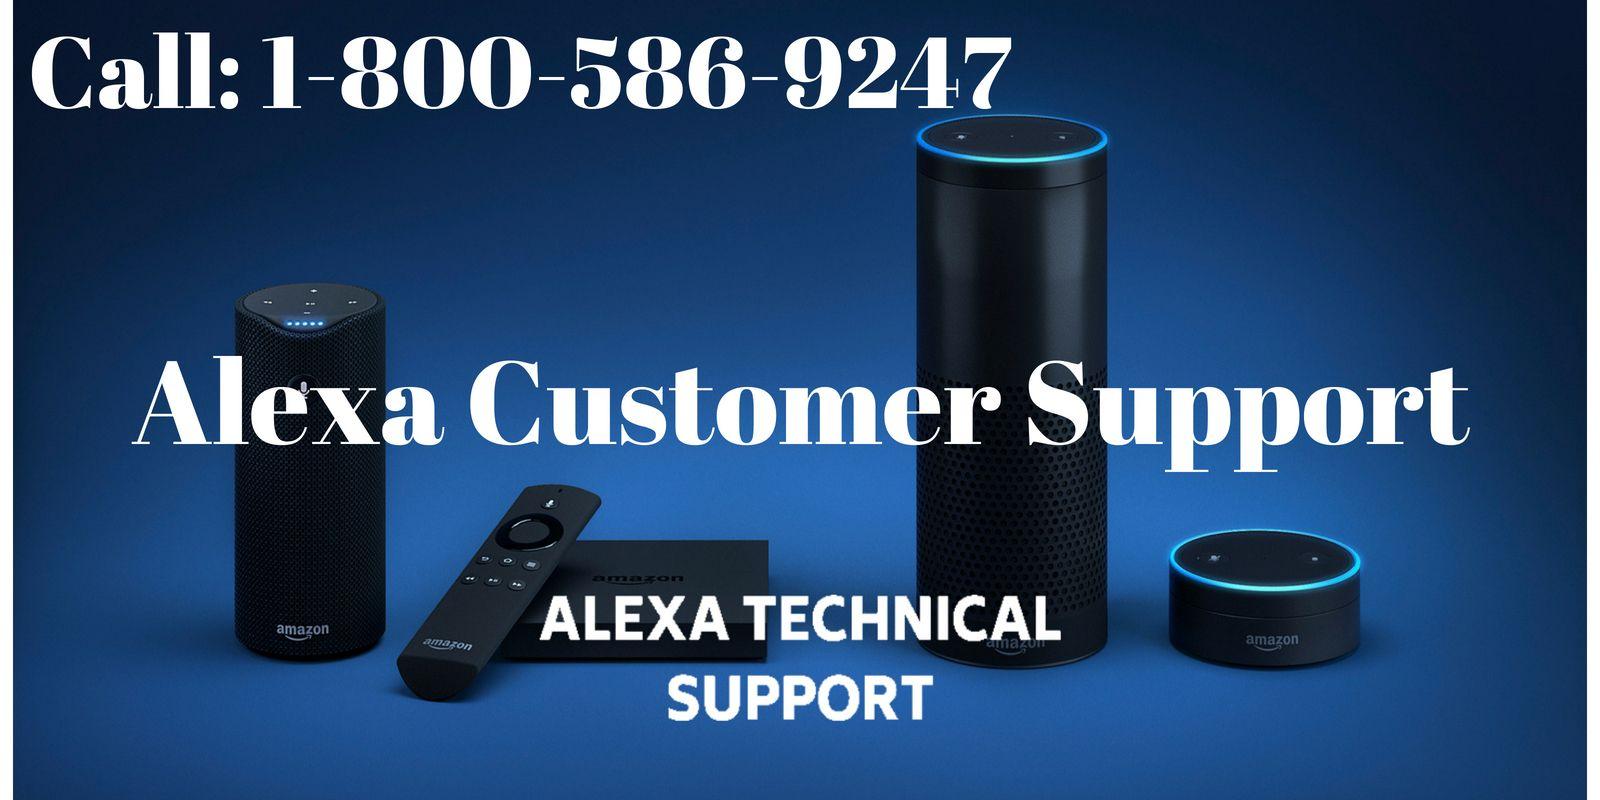 Alexa Customer Service Number Call 18005869247